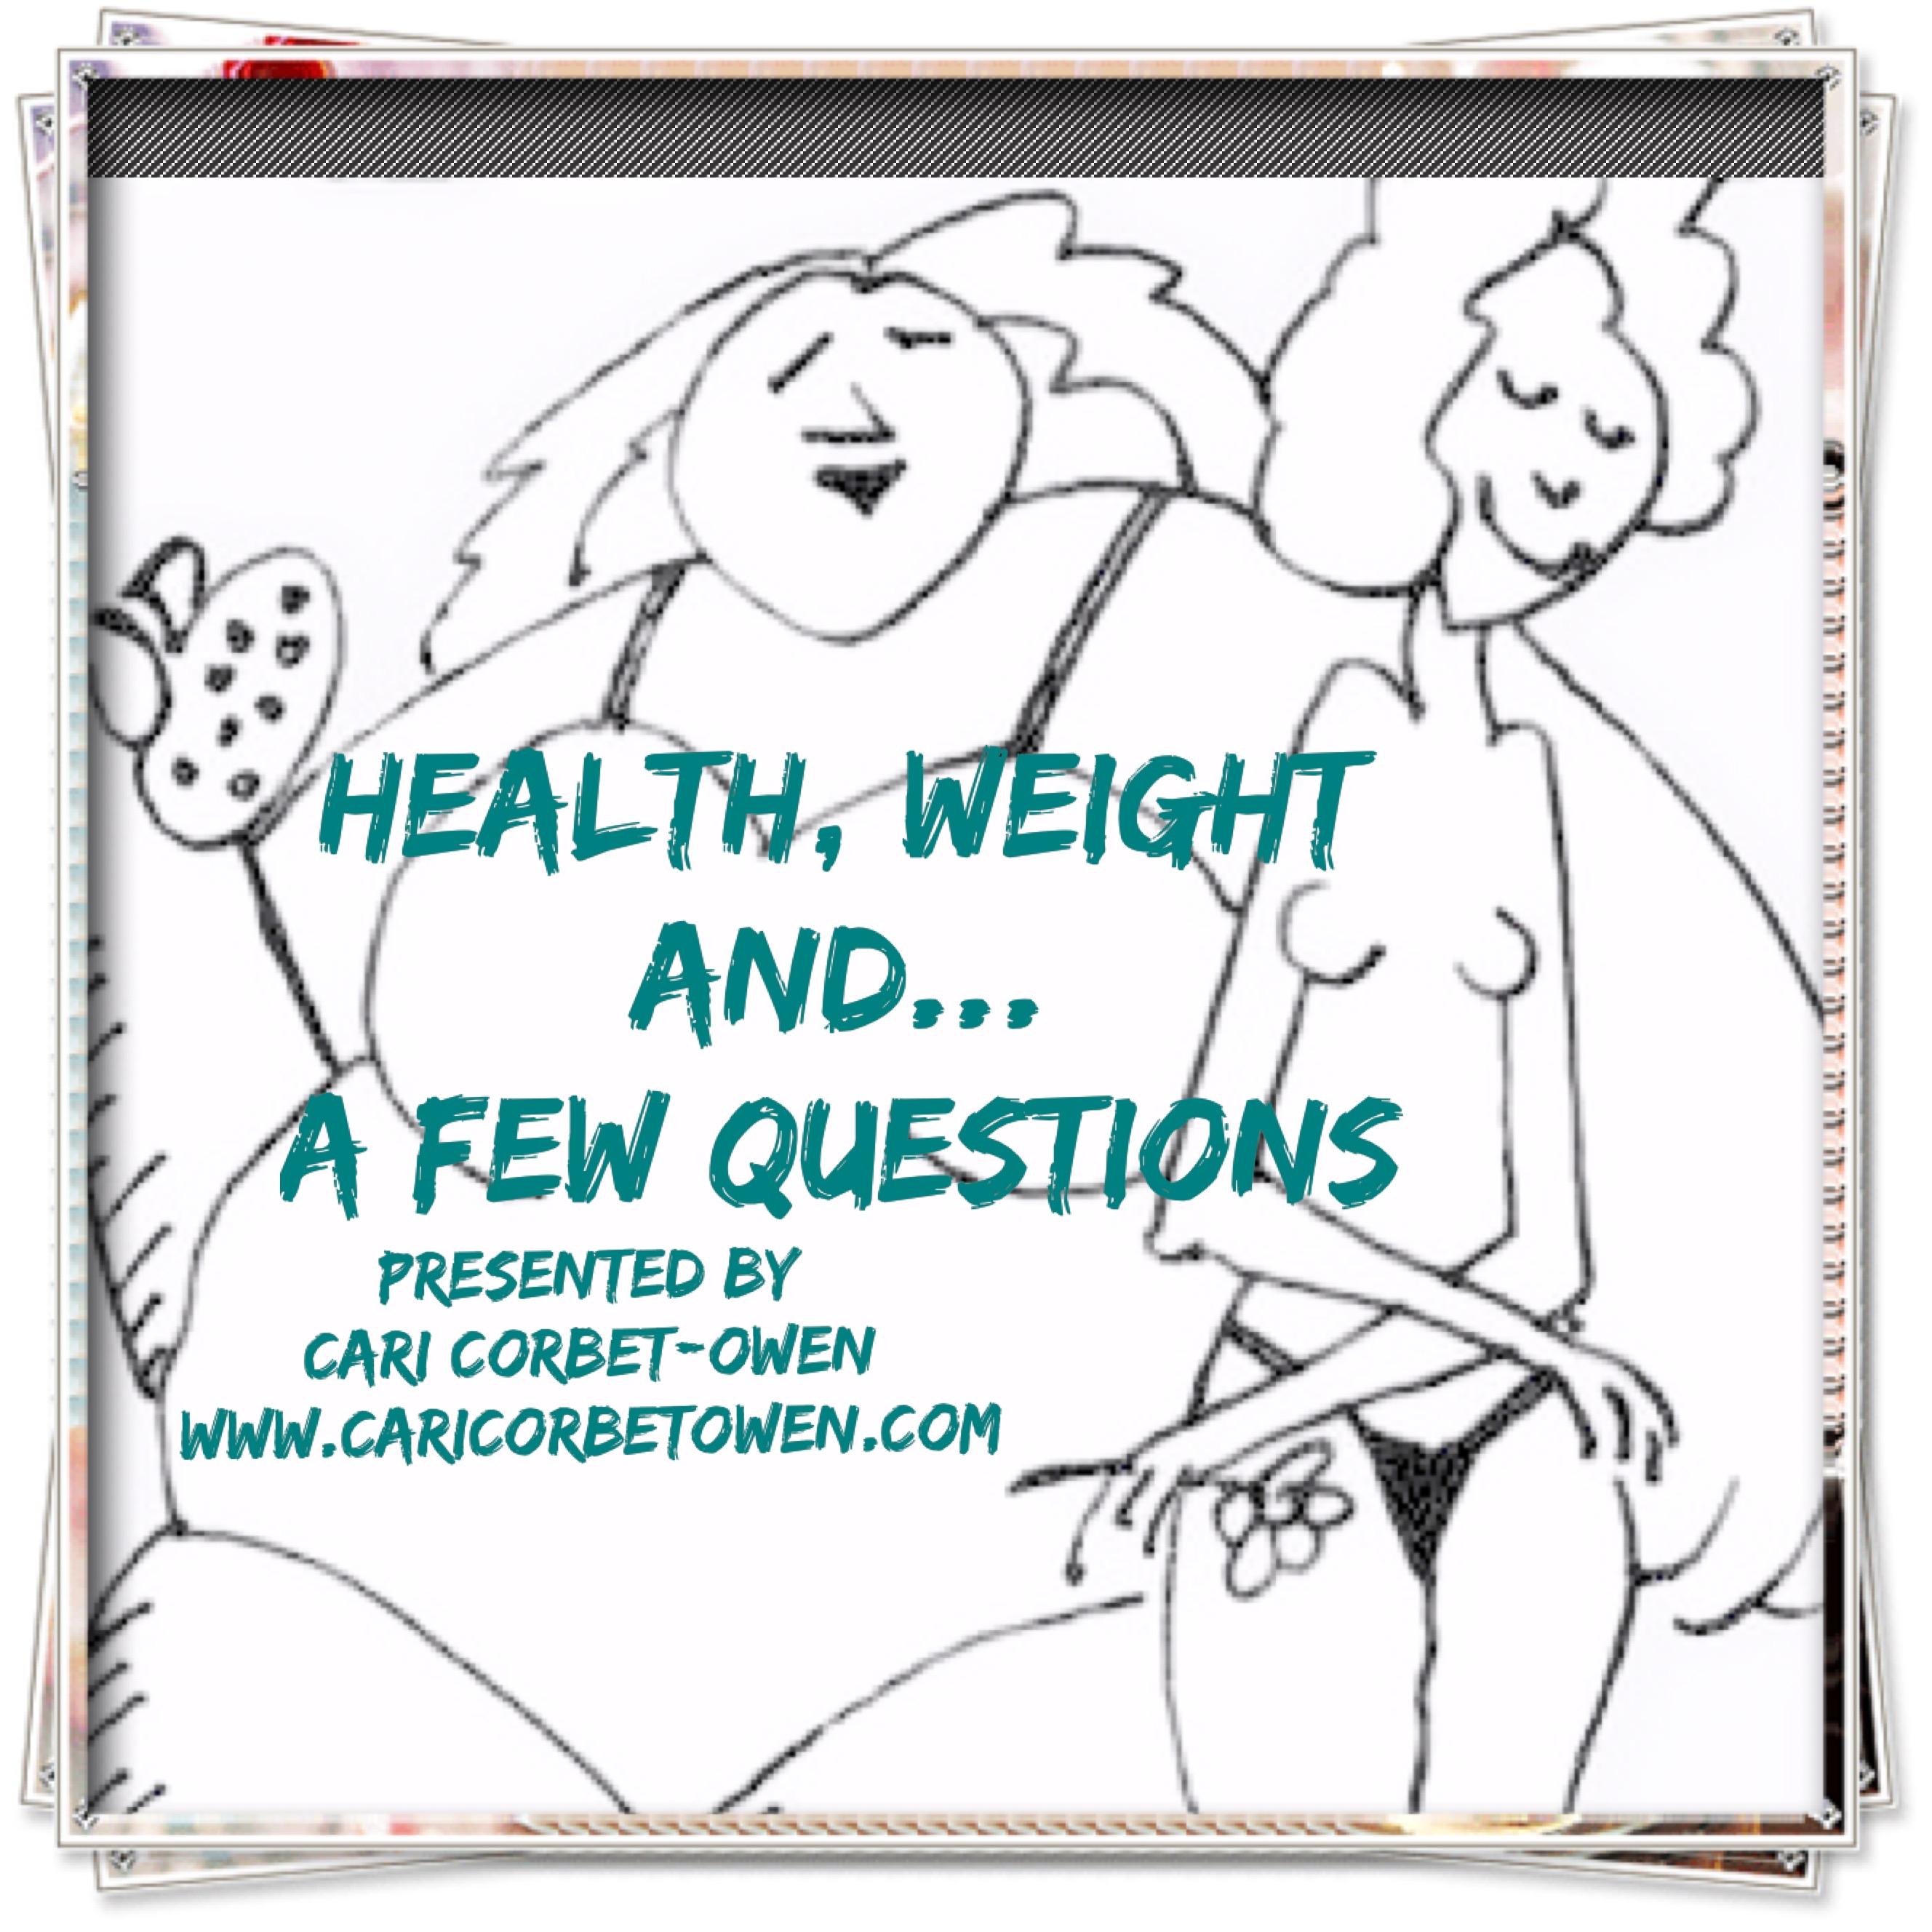 obesity paradox, cari corbet-owen, secrets to longevity